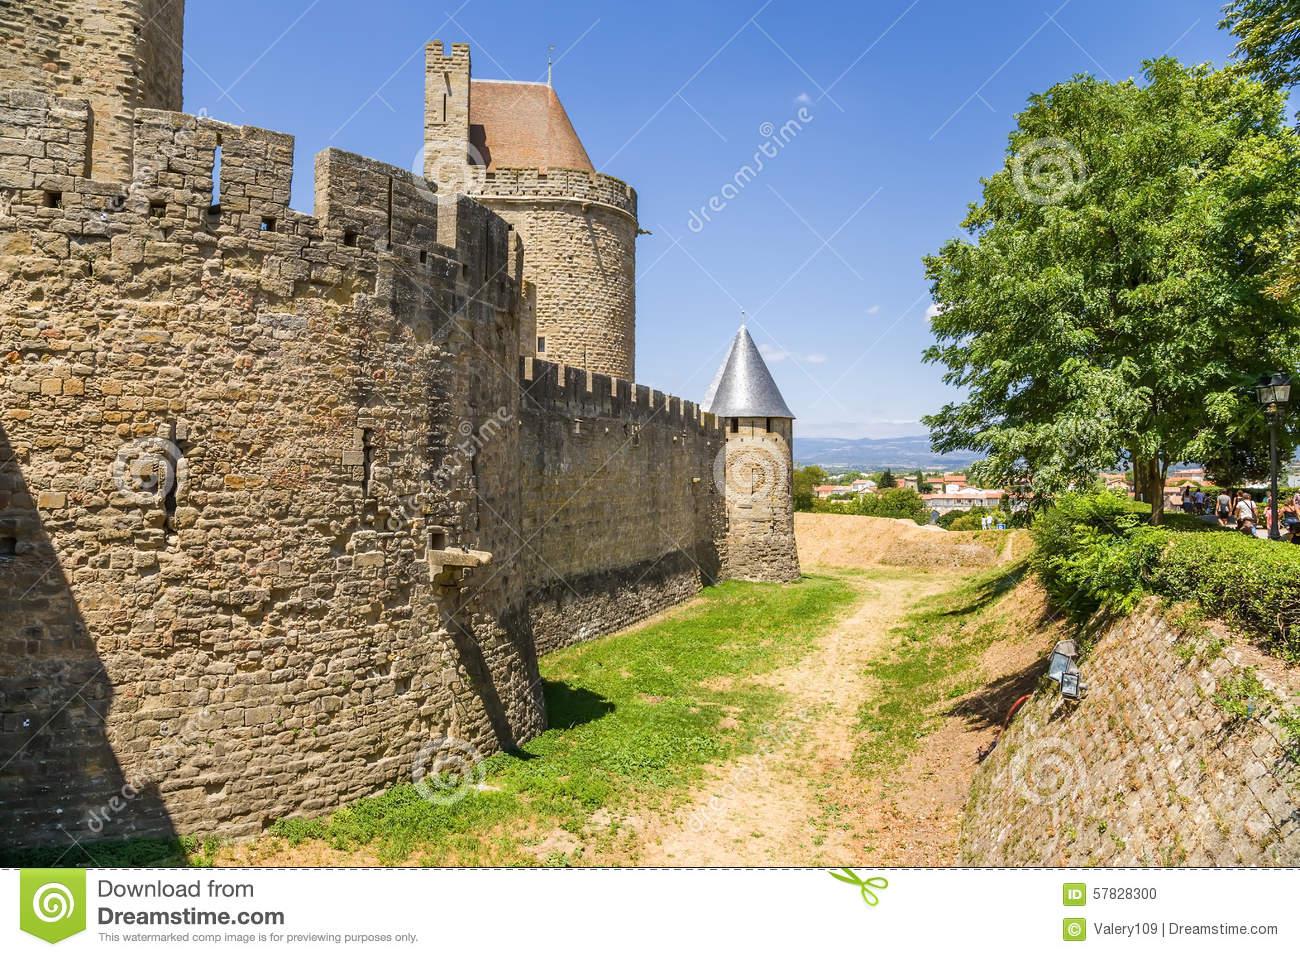 Medieval Castle In Carcassonne, France. UNESCO List Stock Photo.